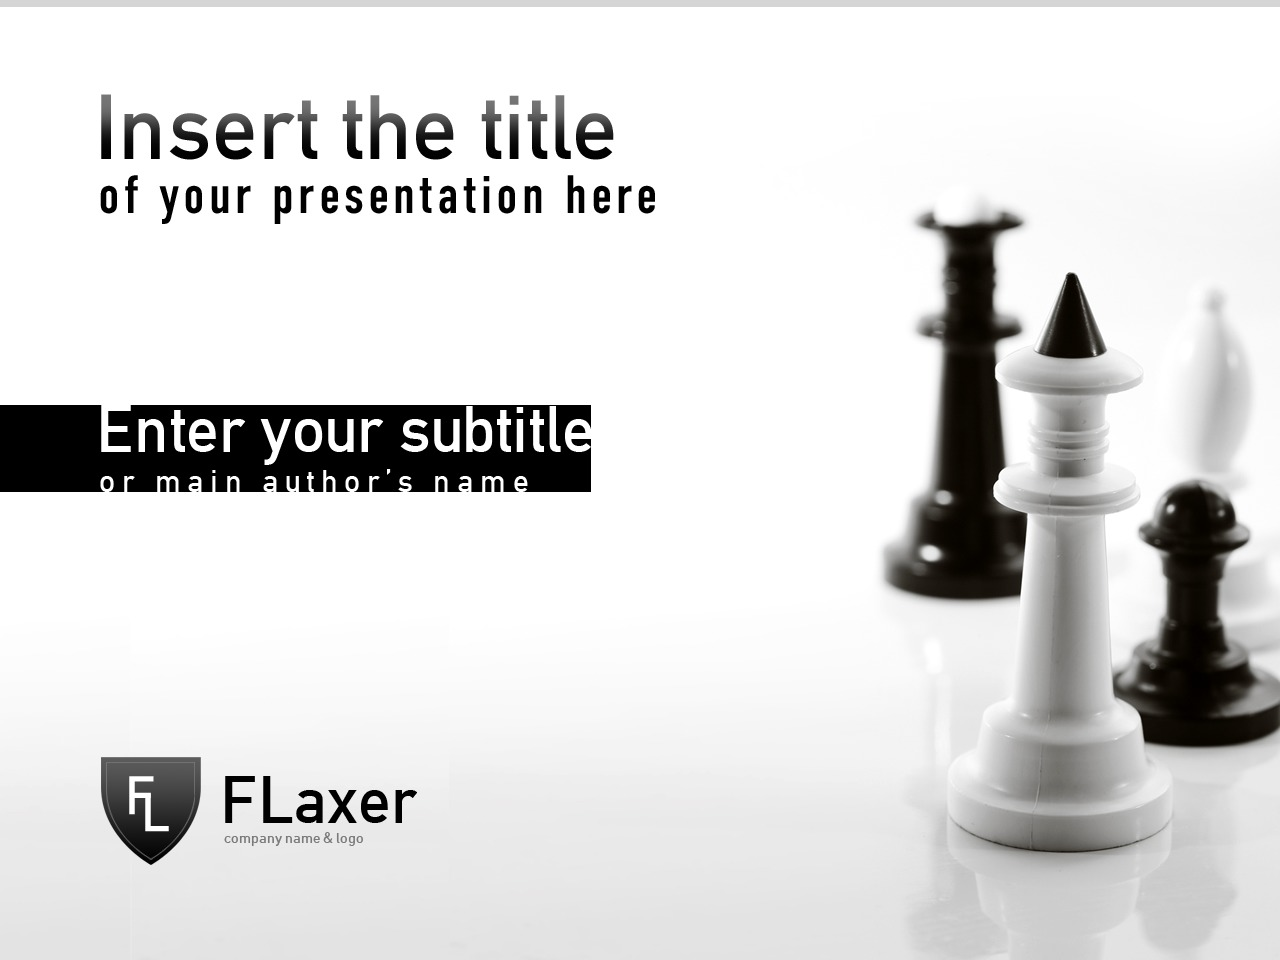 PowerPoint шаблон №24640 на тему маркетинговое агентство